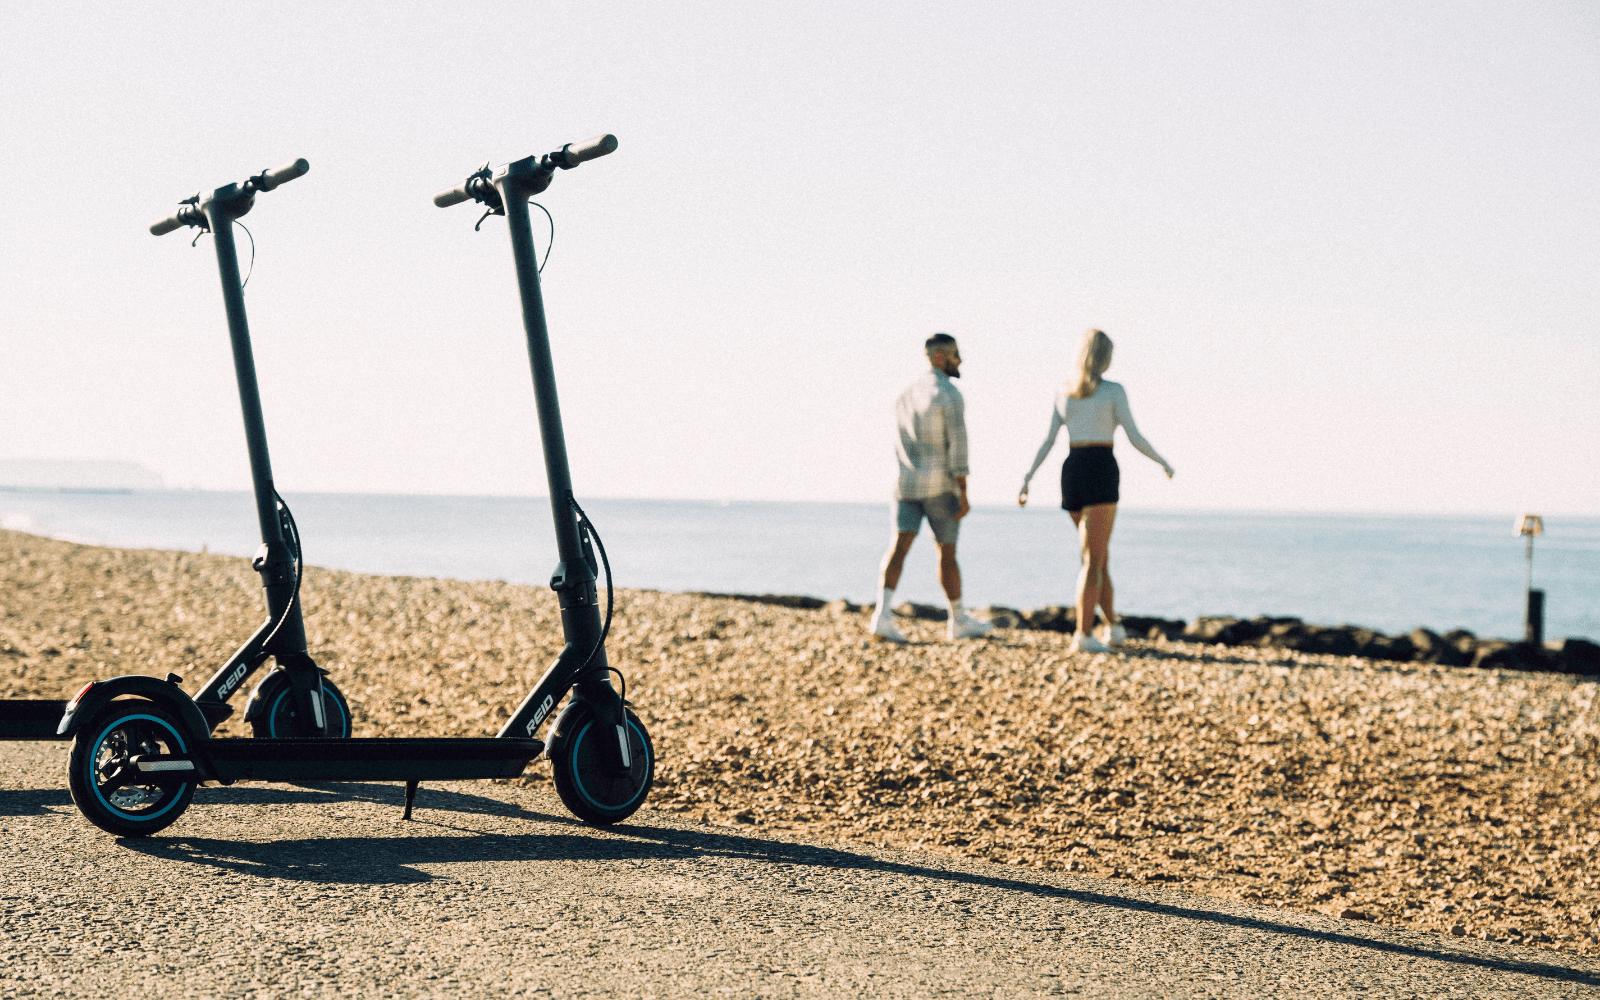 3 60 - Reid ® - Boost eScooter